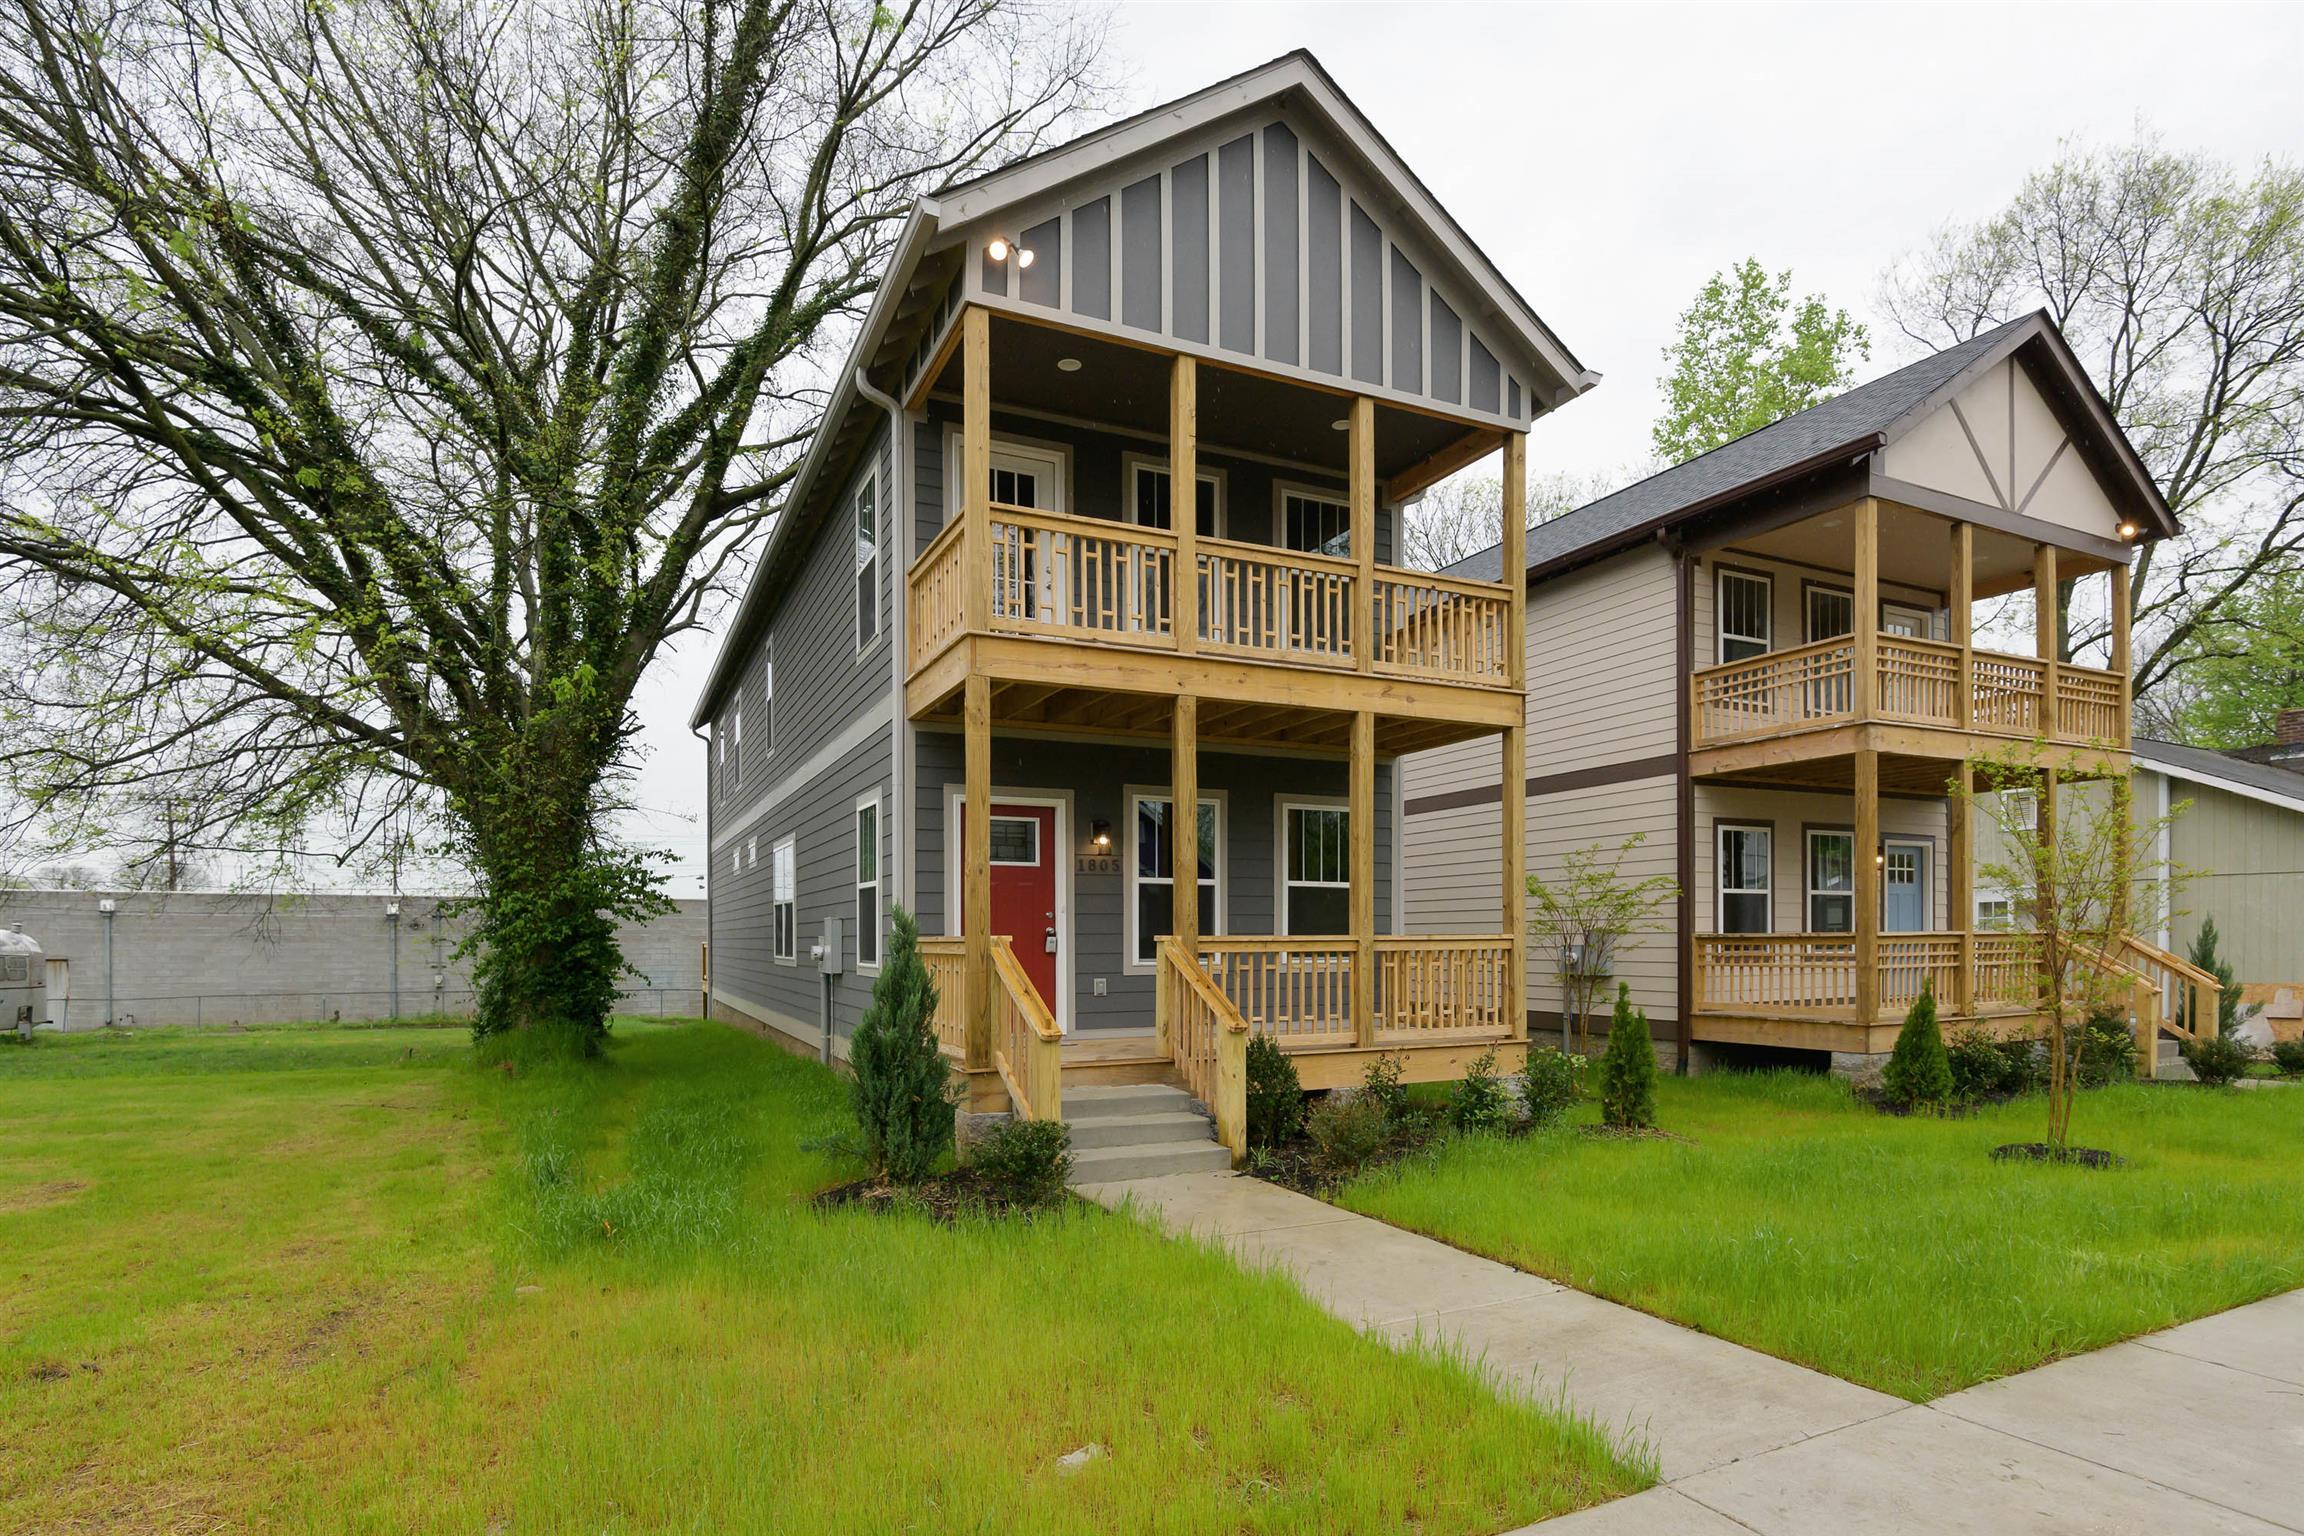 1805 Cephas St, Nashville, TN 37208 - Nashville, TN real estate listing